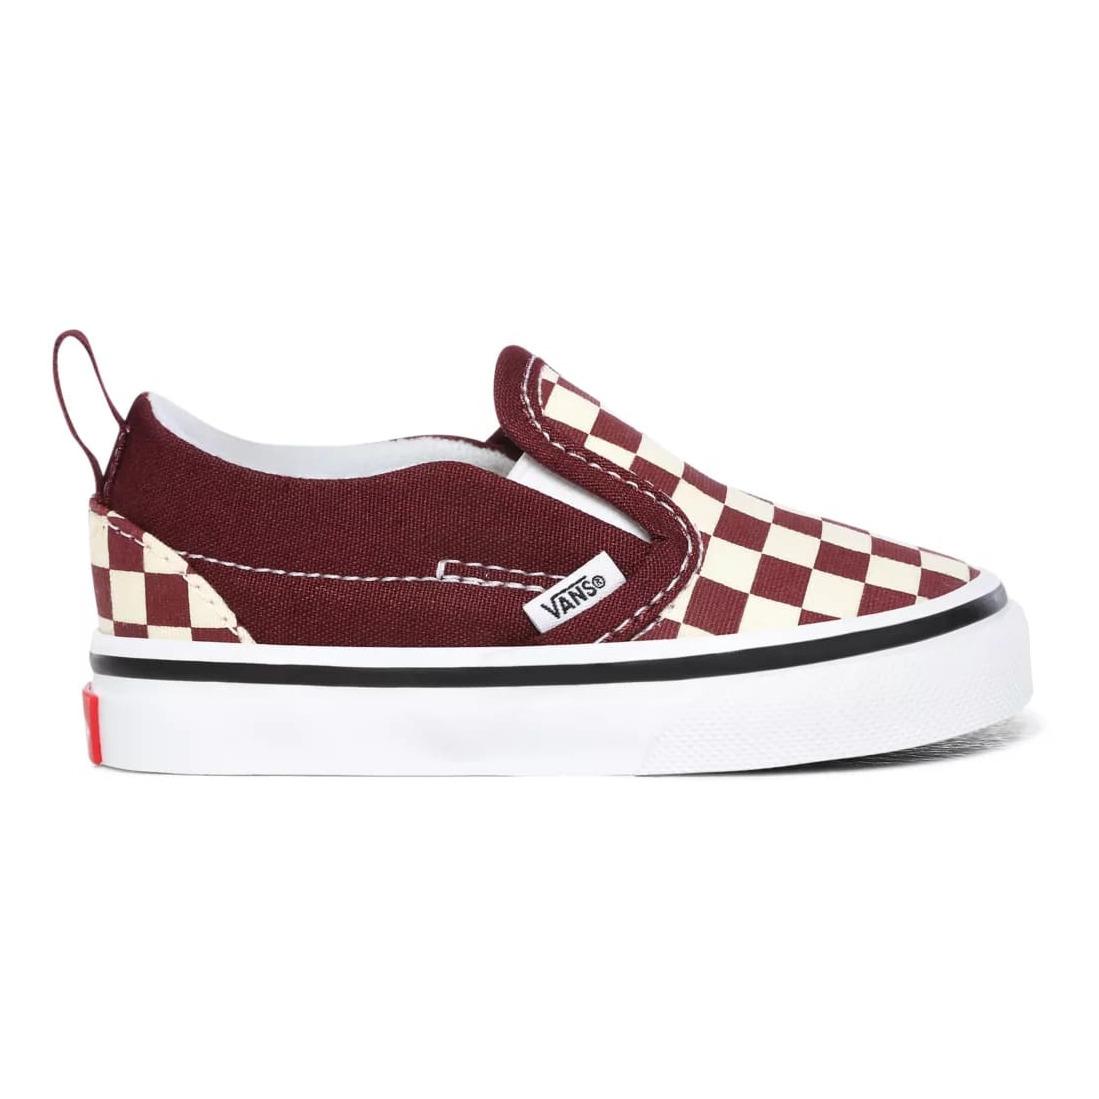 Velcro Slip On Sneakers Burgundy Vans